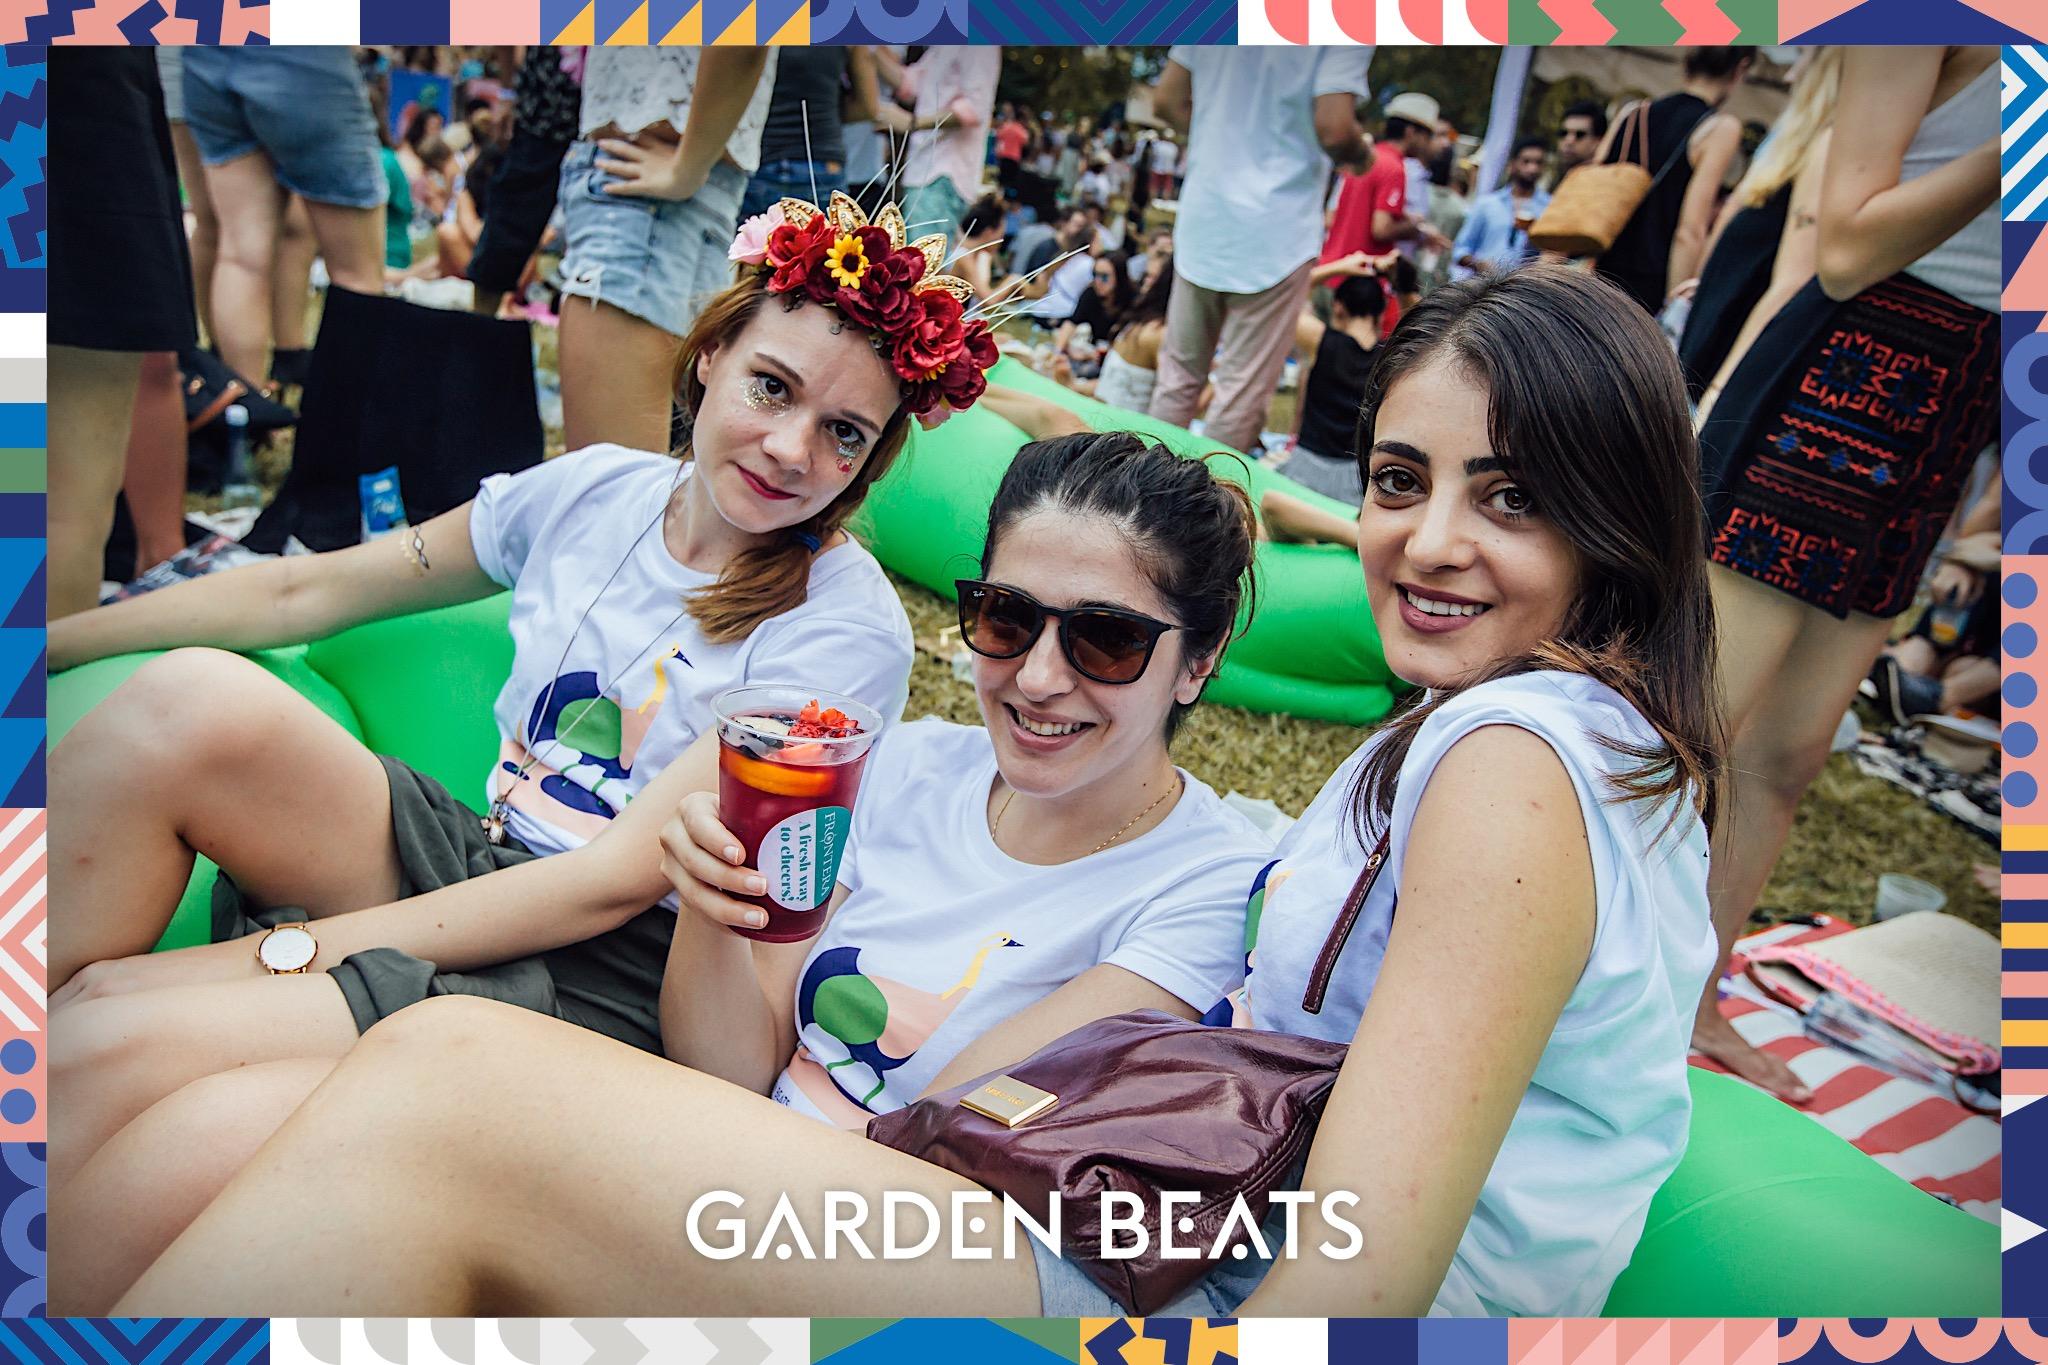 18032017_GardenBeats_Colossal572_WatermarkedGB.jpg